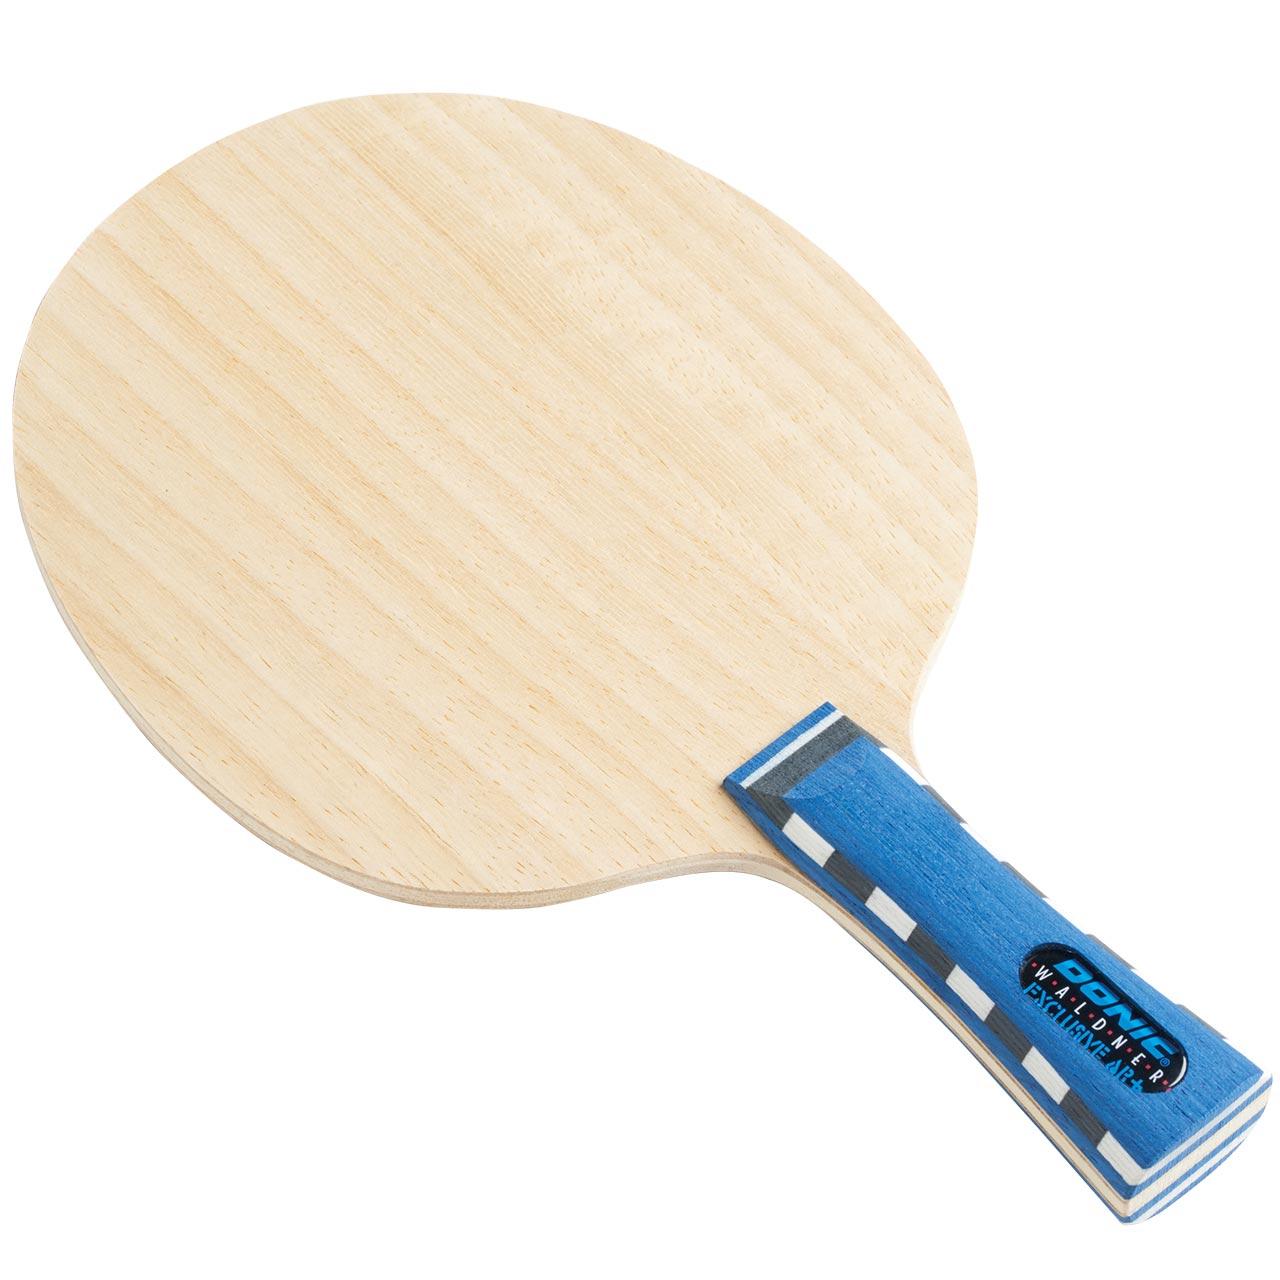 Donic Defplay Classic Senso  Tischtennis-Holz Tischtennisholz